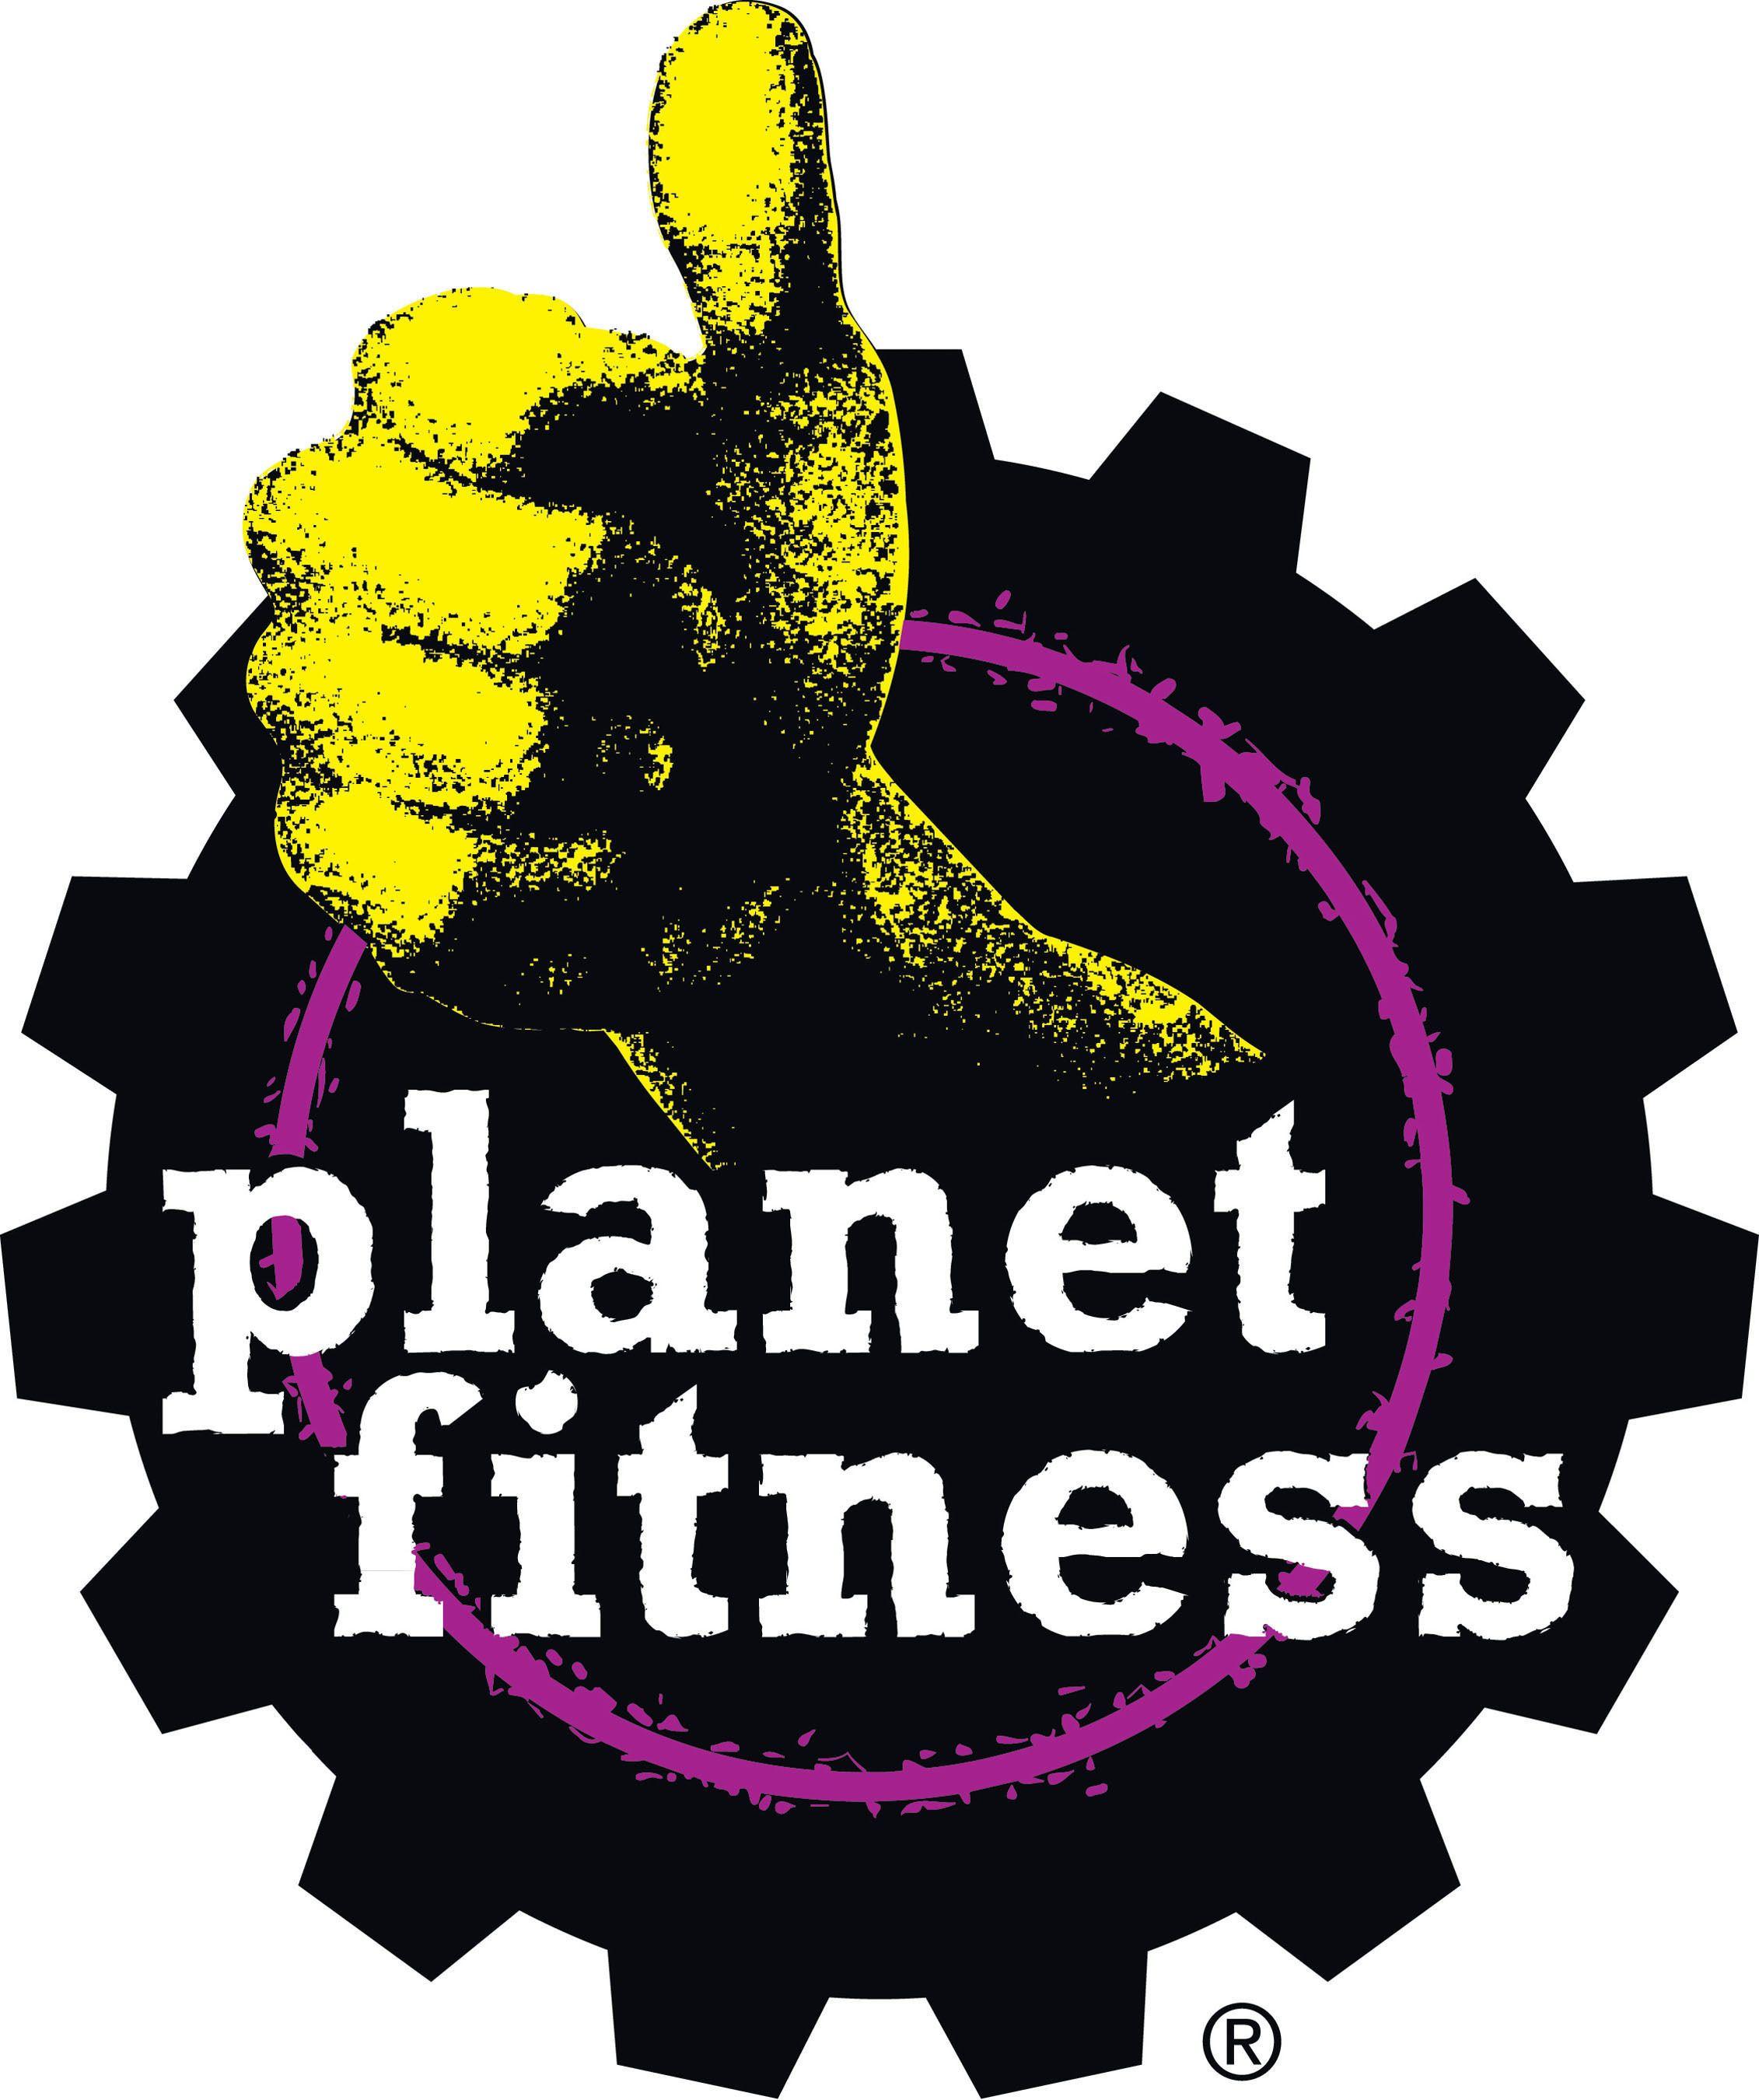 Planet fitness franchise fitness centers fitness center design planet fitness franchise fitness centers buycottarizona Choice Image